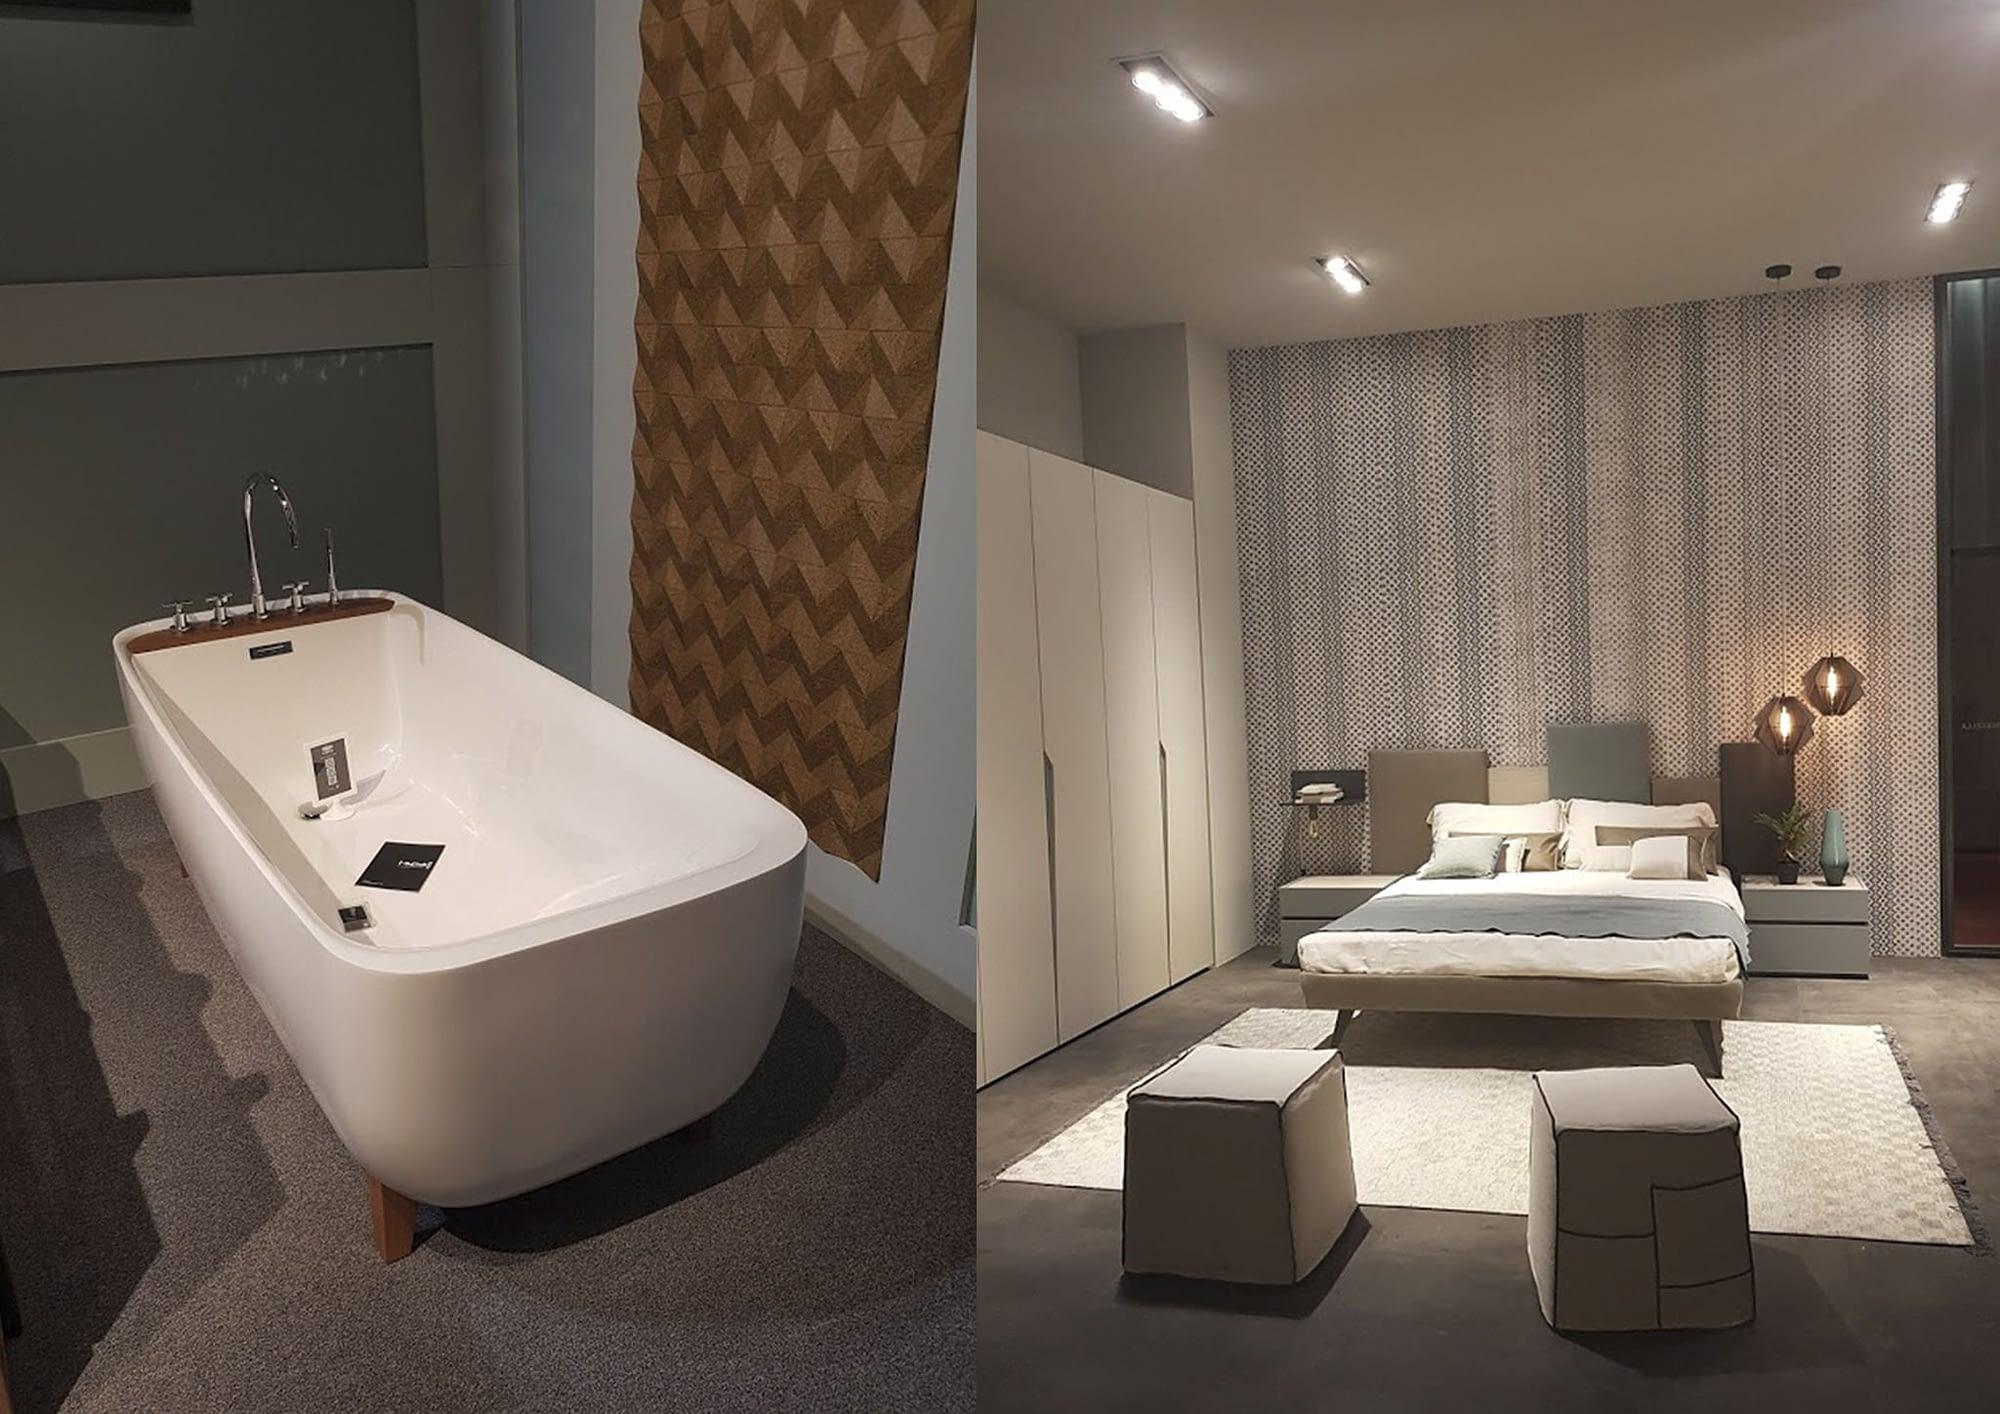 Milano Design Week 2018 - Salone del Mobile 25